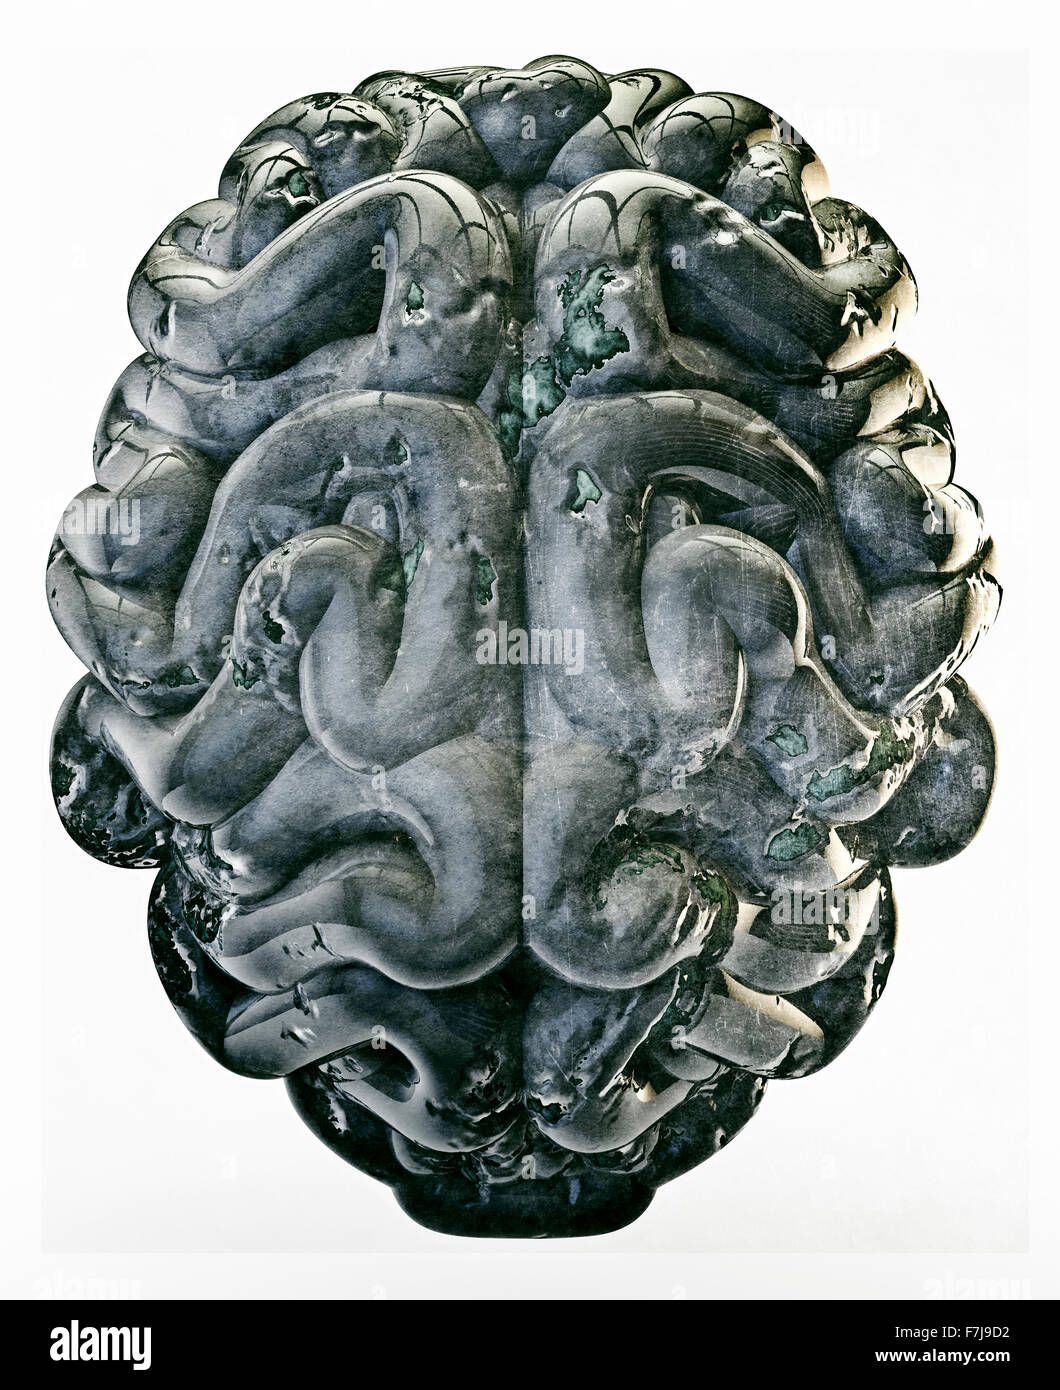 Grunge brain / 3D render of brain isolated on white - Stock Image